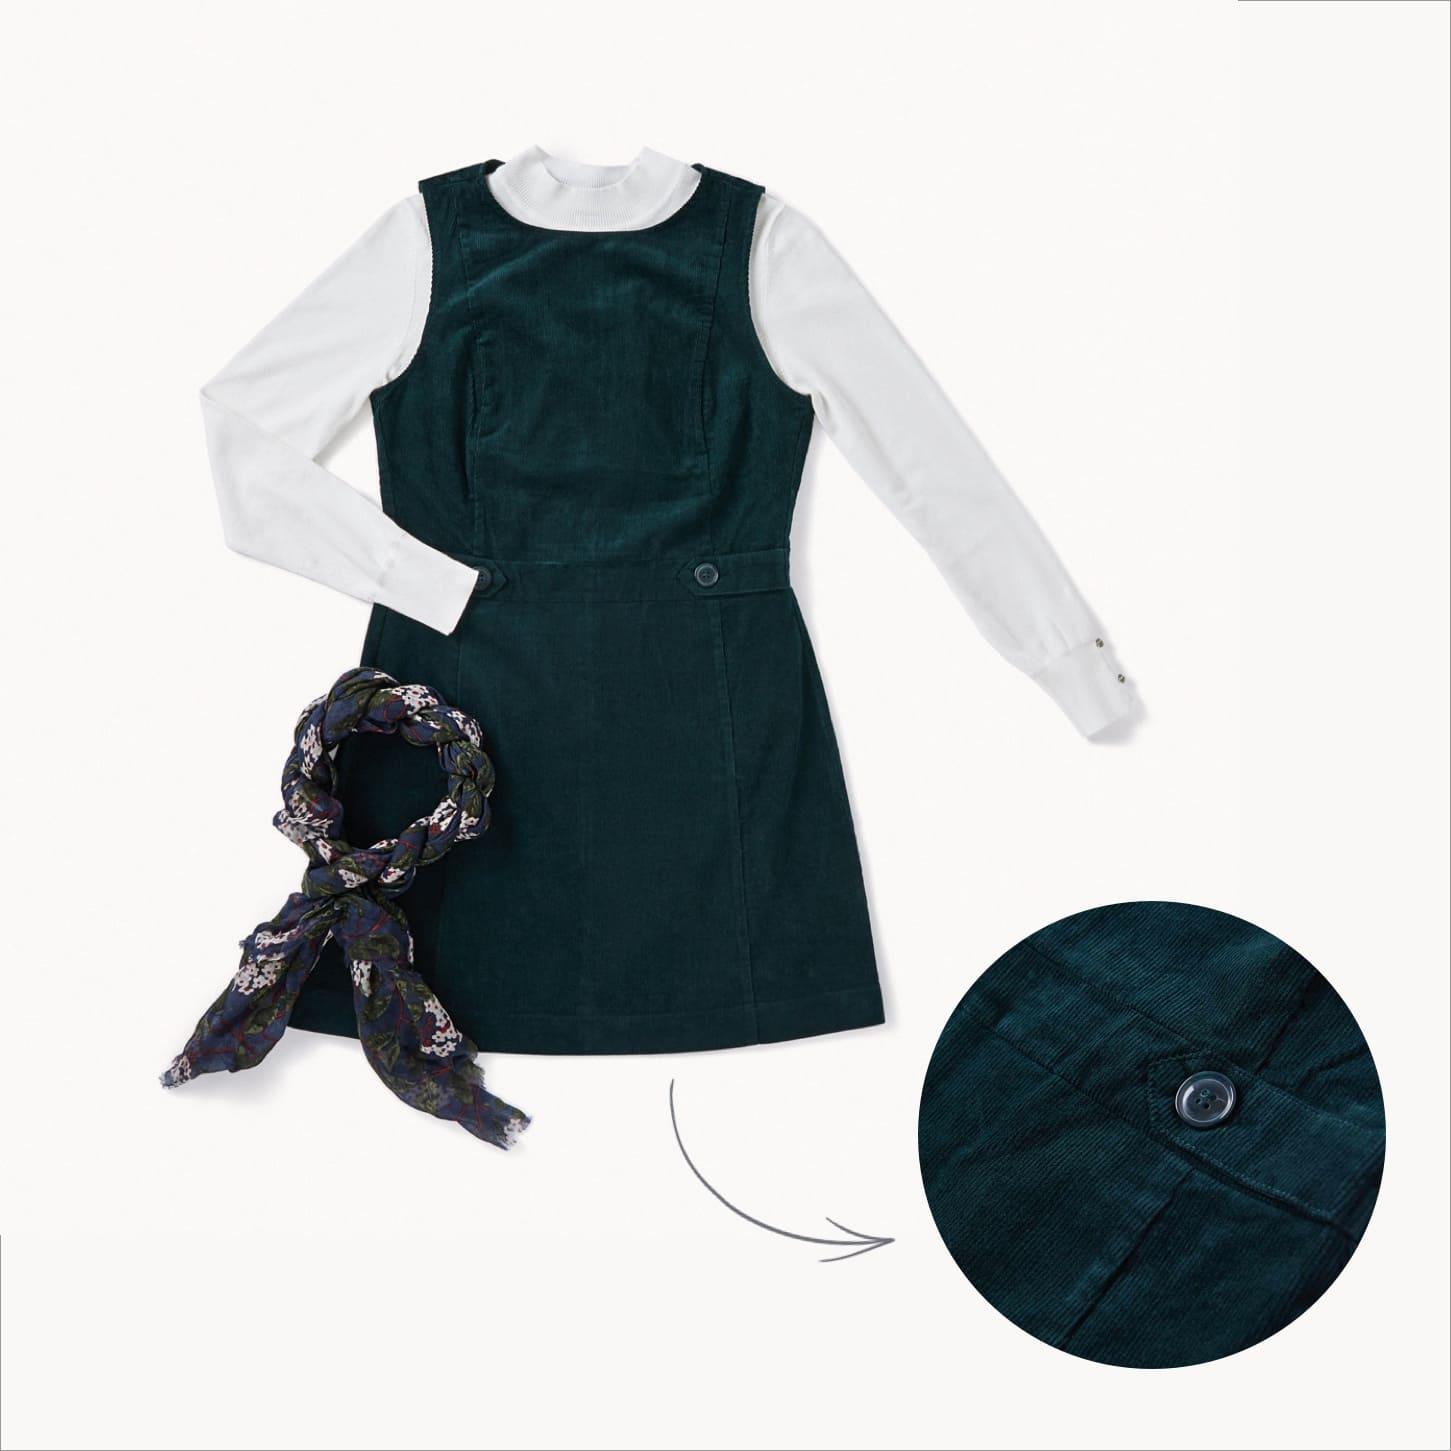 la robe en velours côtelé